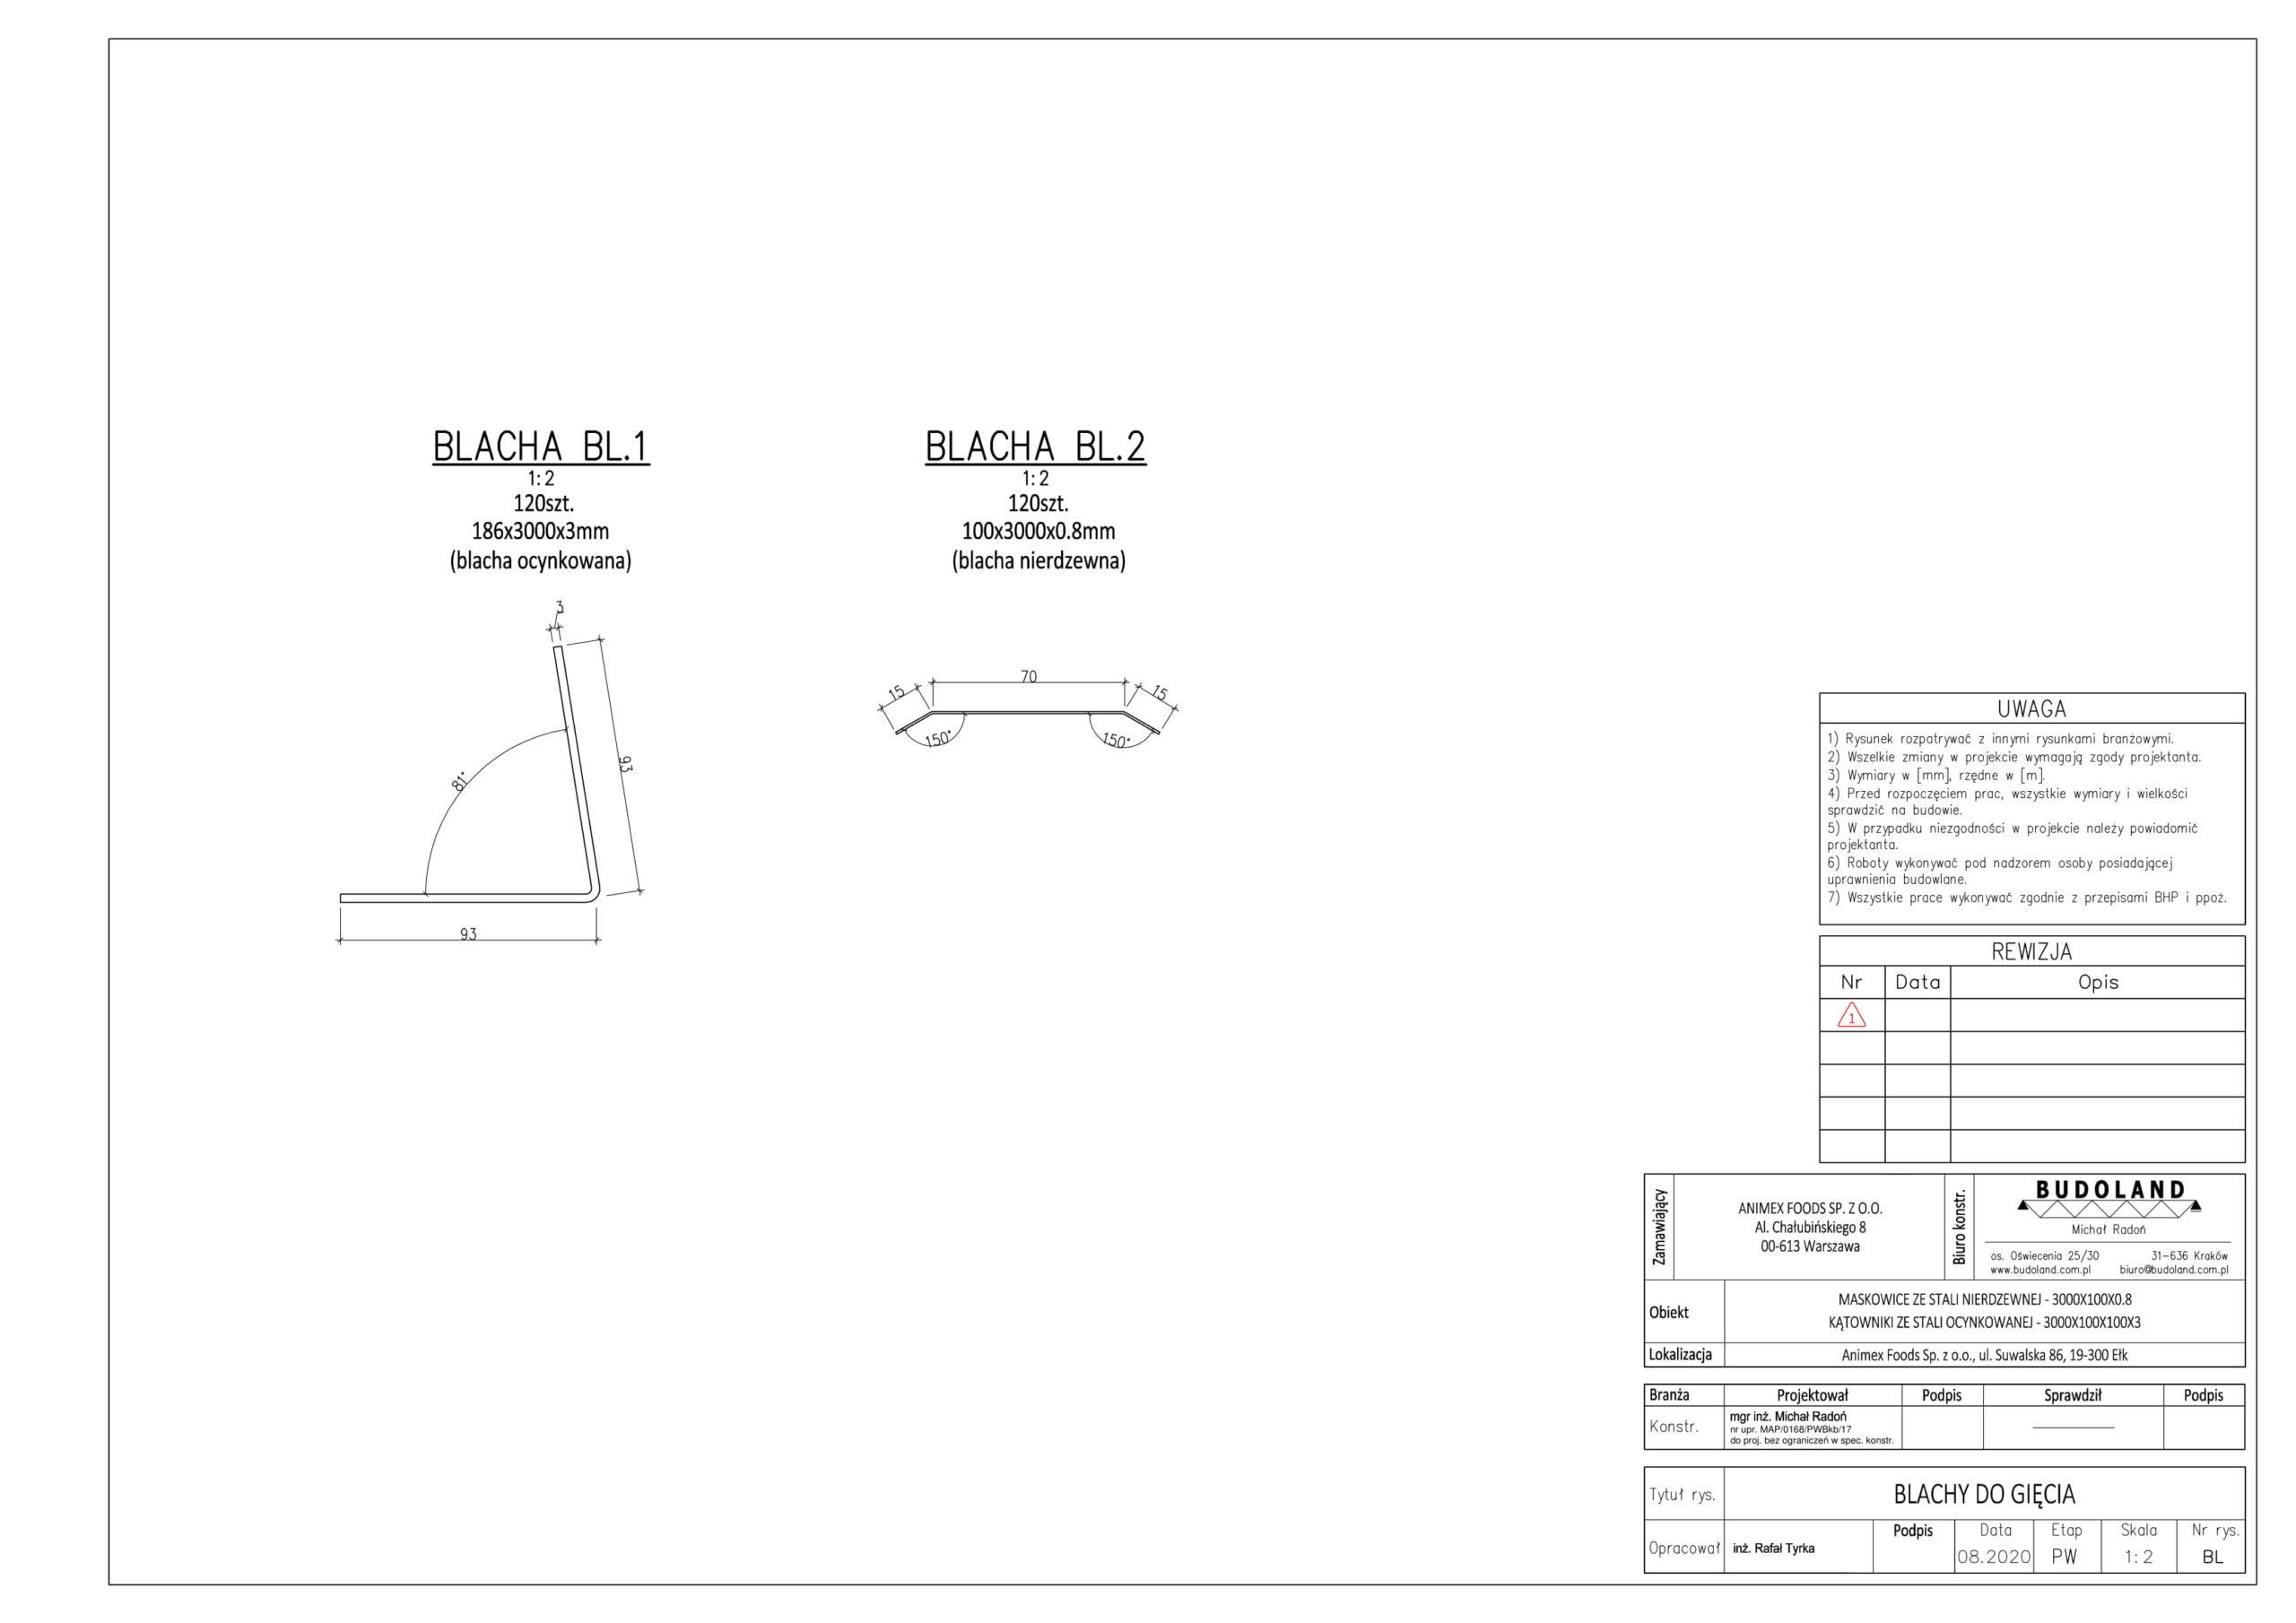 17.08.2020 - Blachy - Animex-BL-1